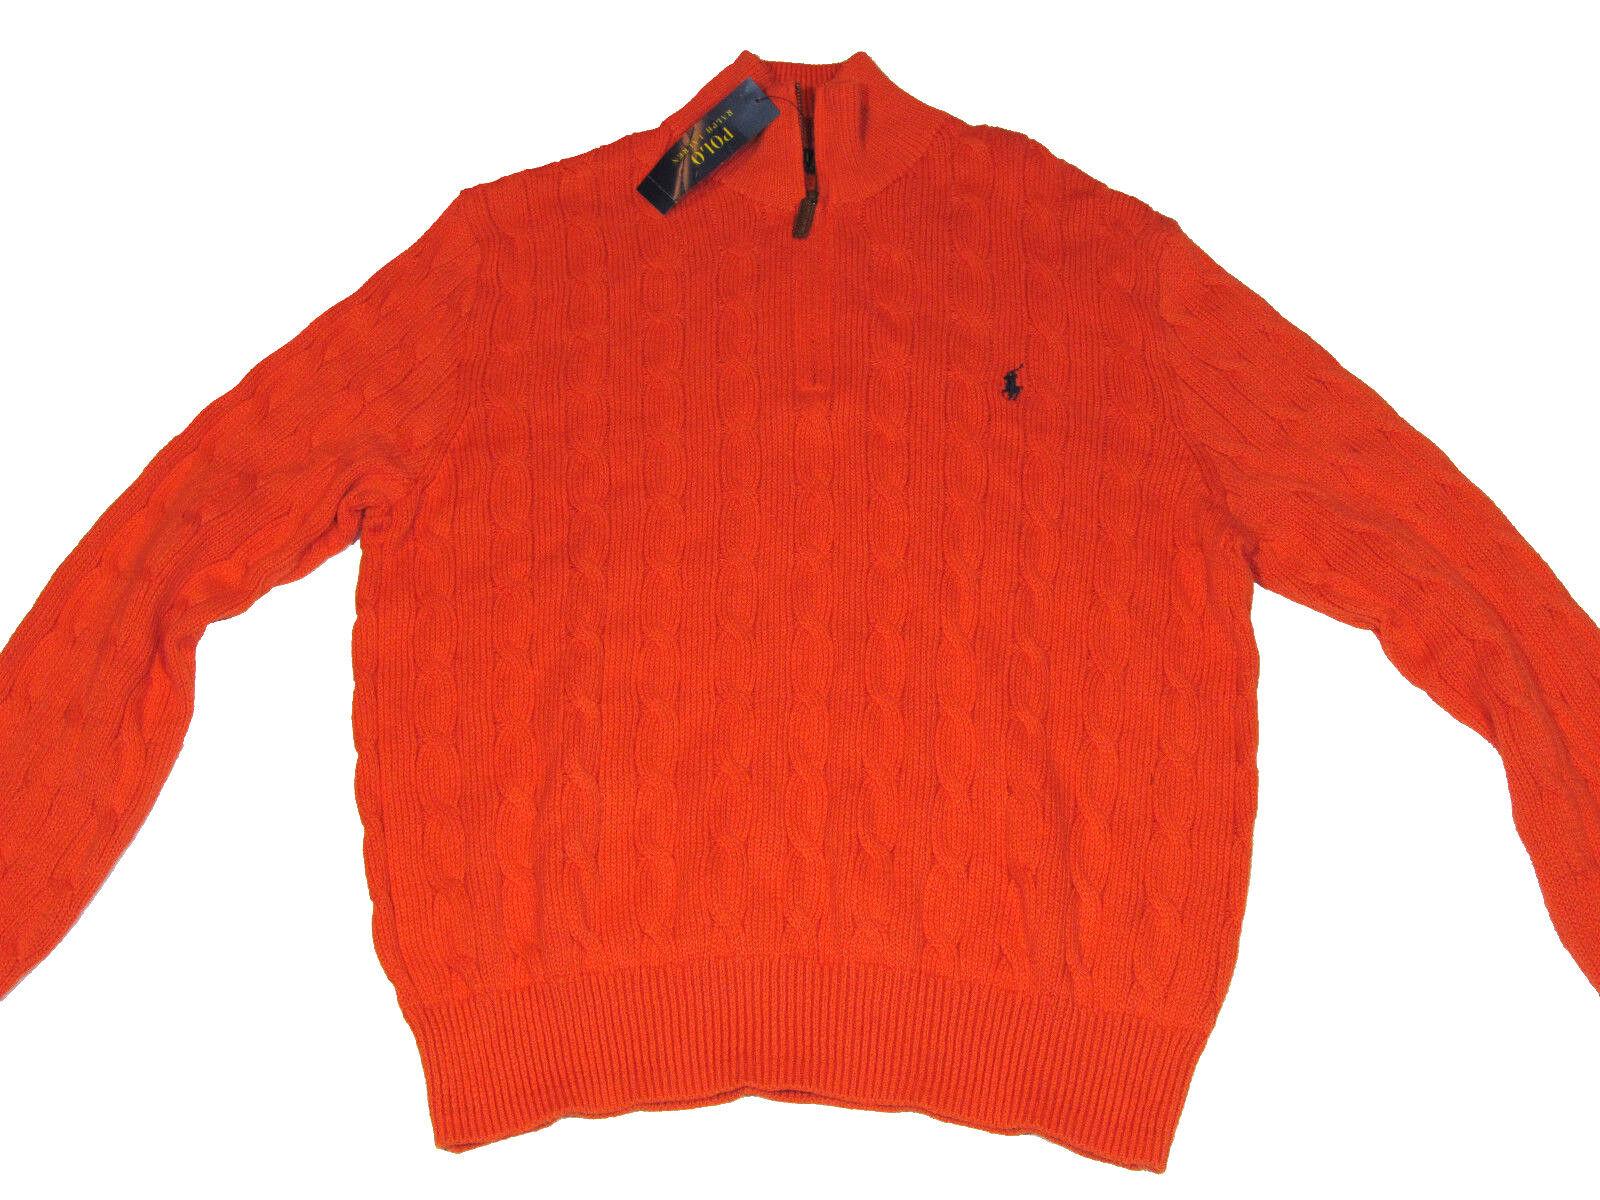 NWT Ralph Lauren Polo Mens Size L orange Sweater w Zipper  MSRP